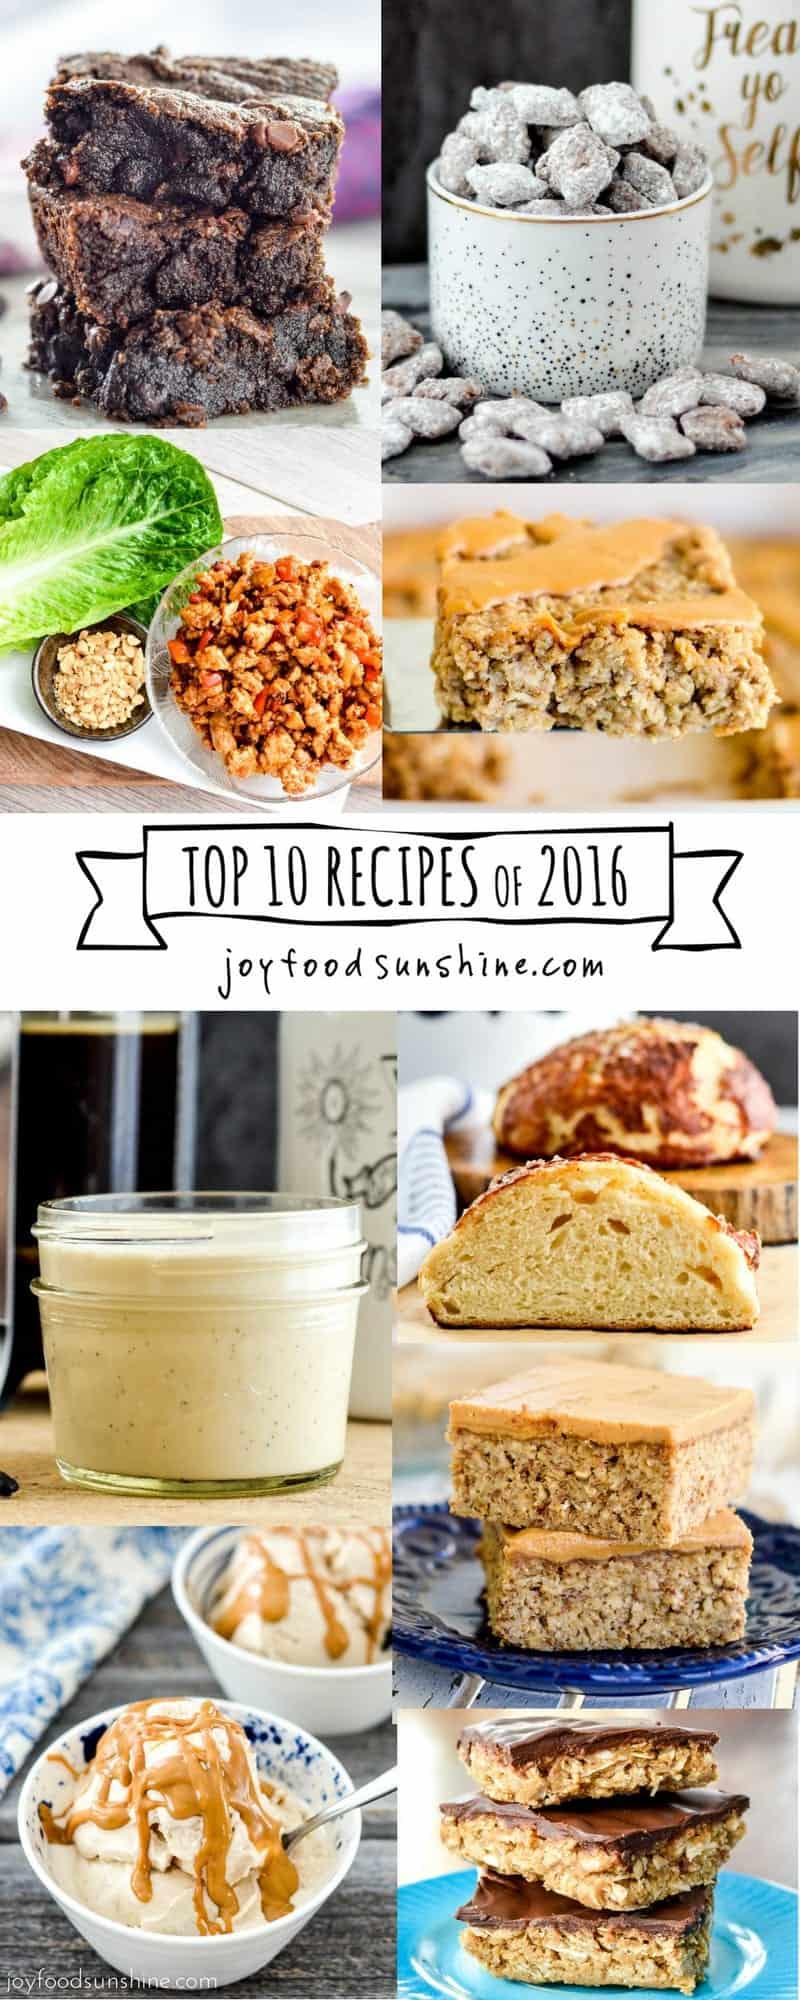 Top 10 Recipes of 2016 from JoyFoodSunshine.com